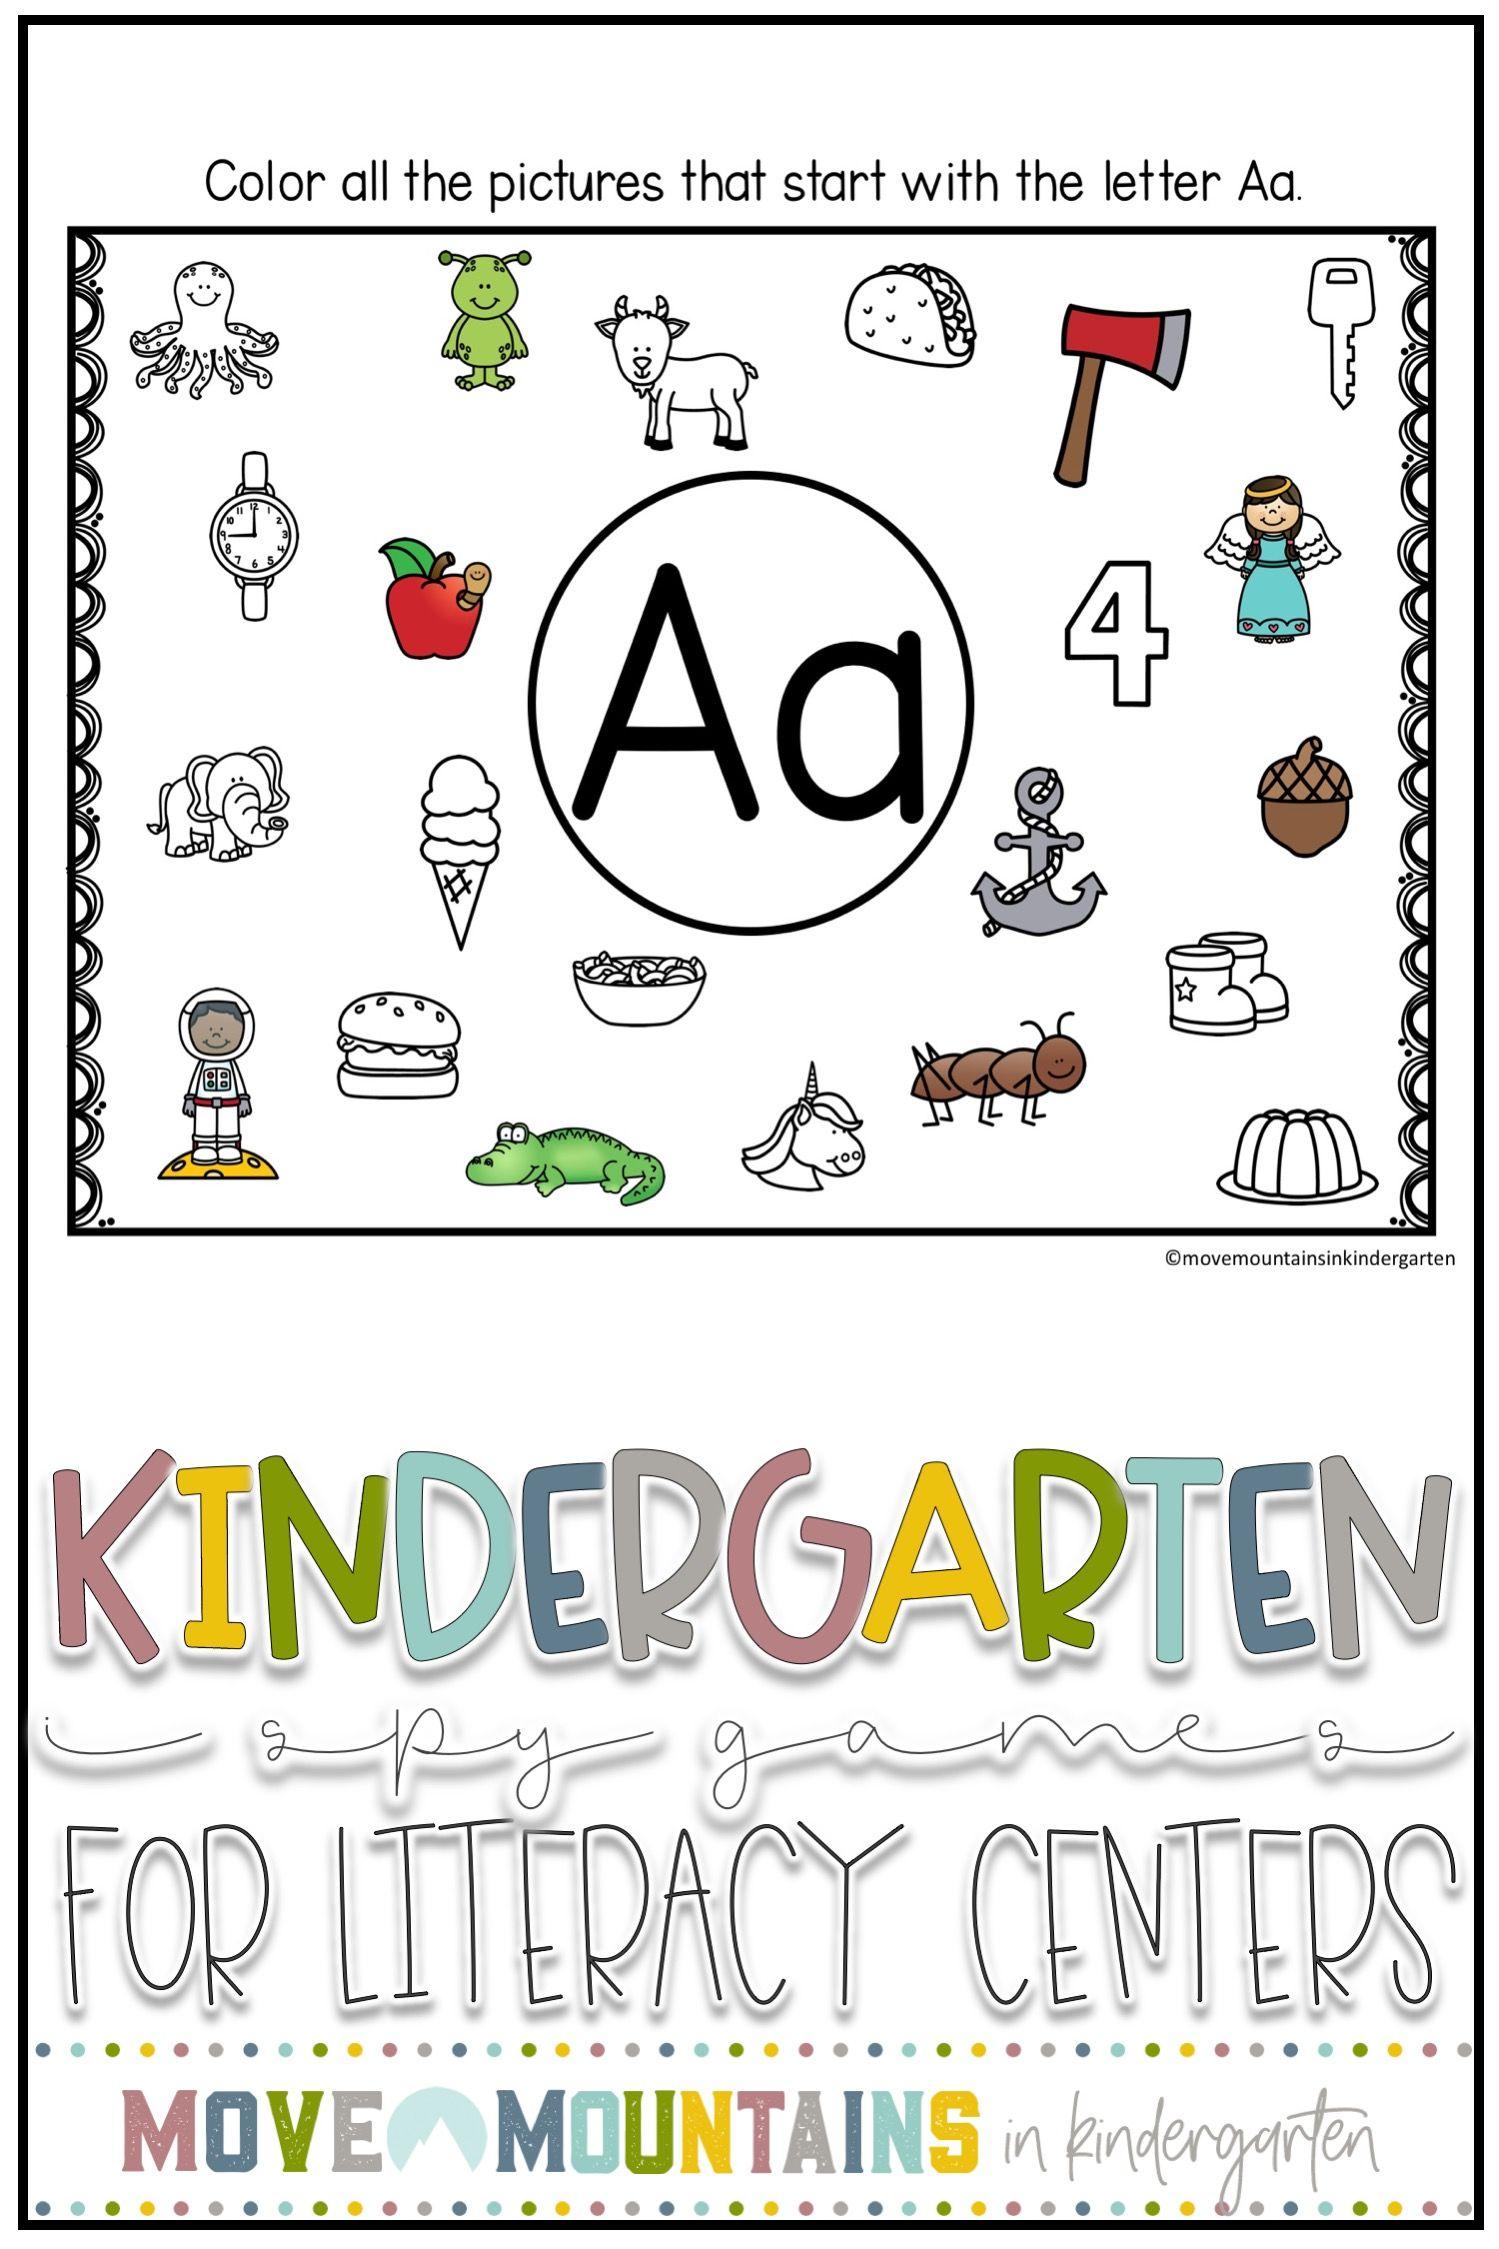 I Spy Printable For Kindergarten